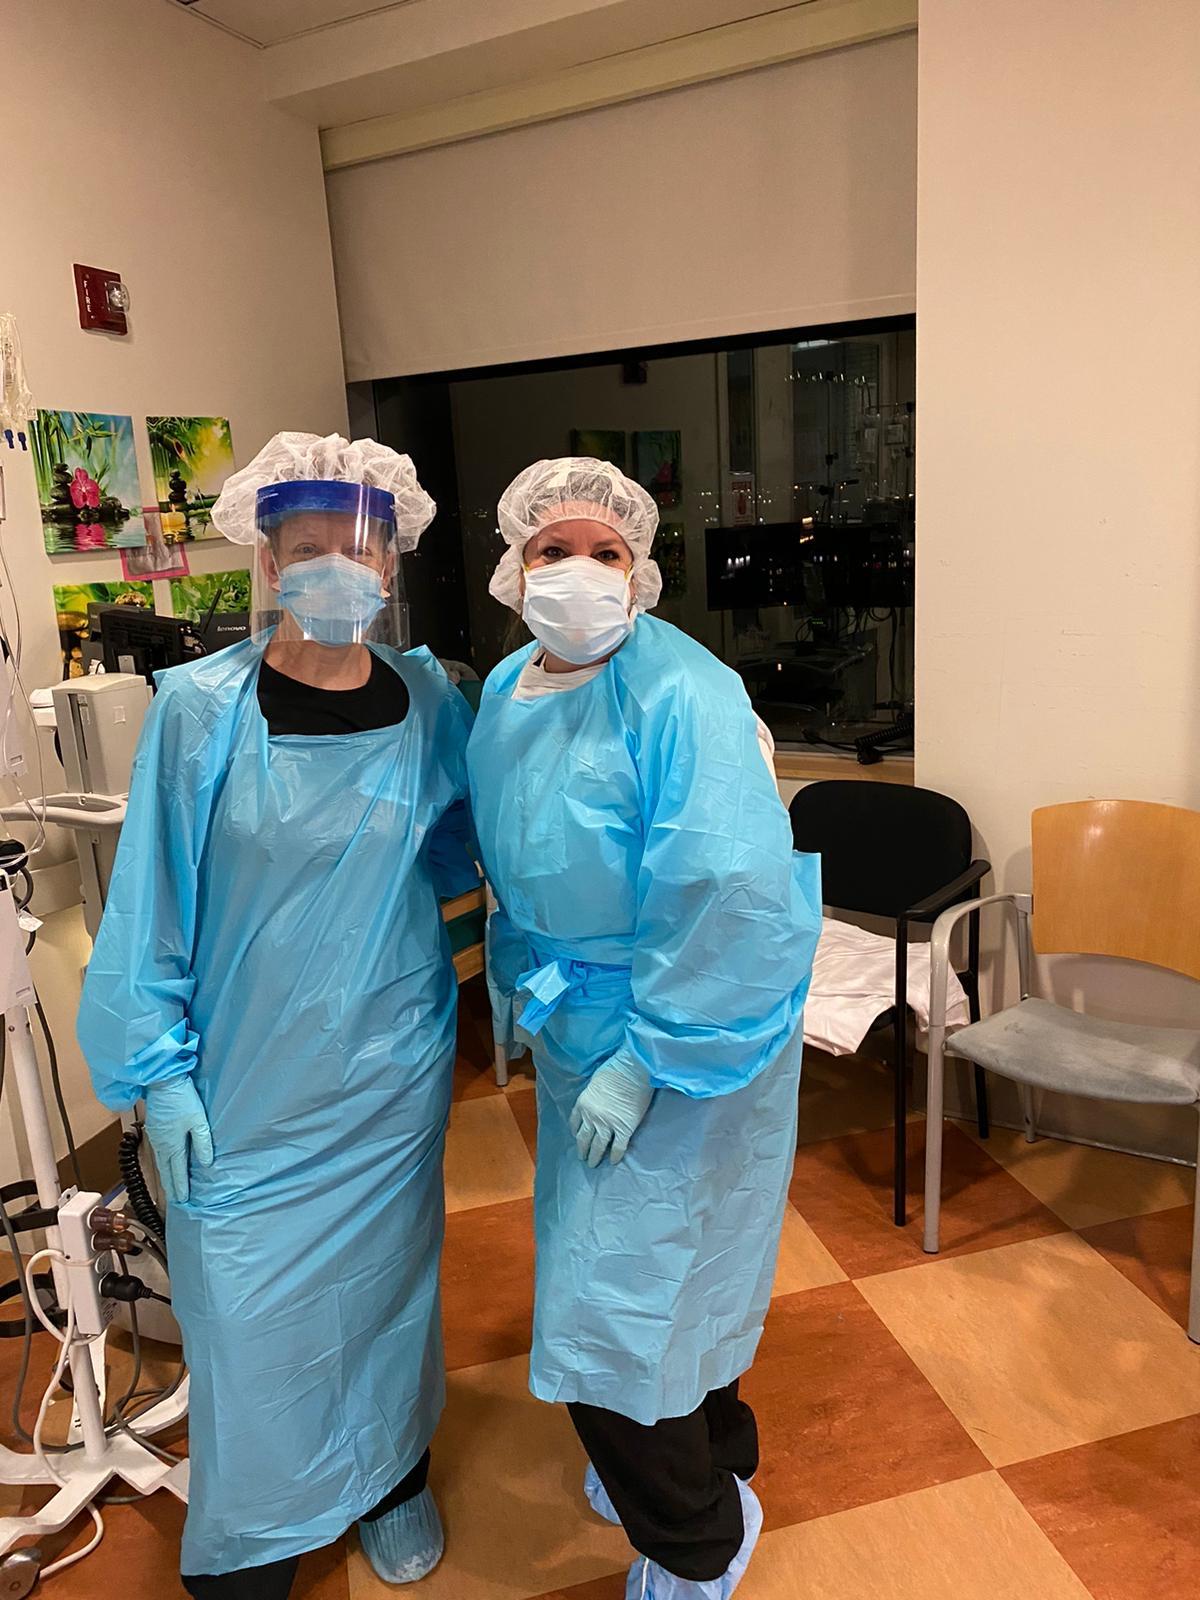 Kim Spray and Amy BowenVolunteers in NYC at Maimonides